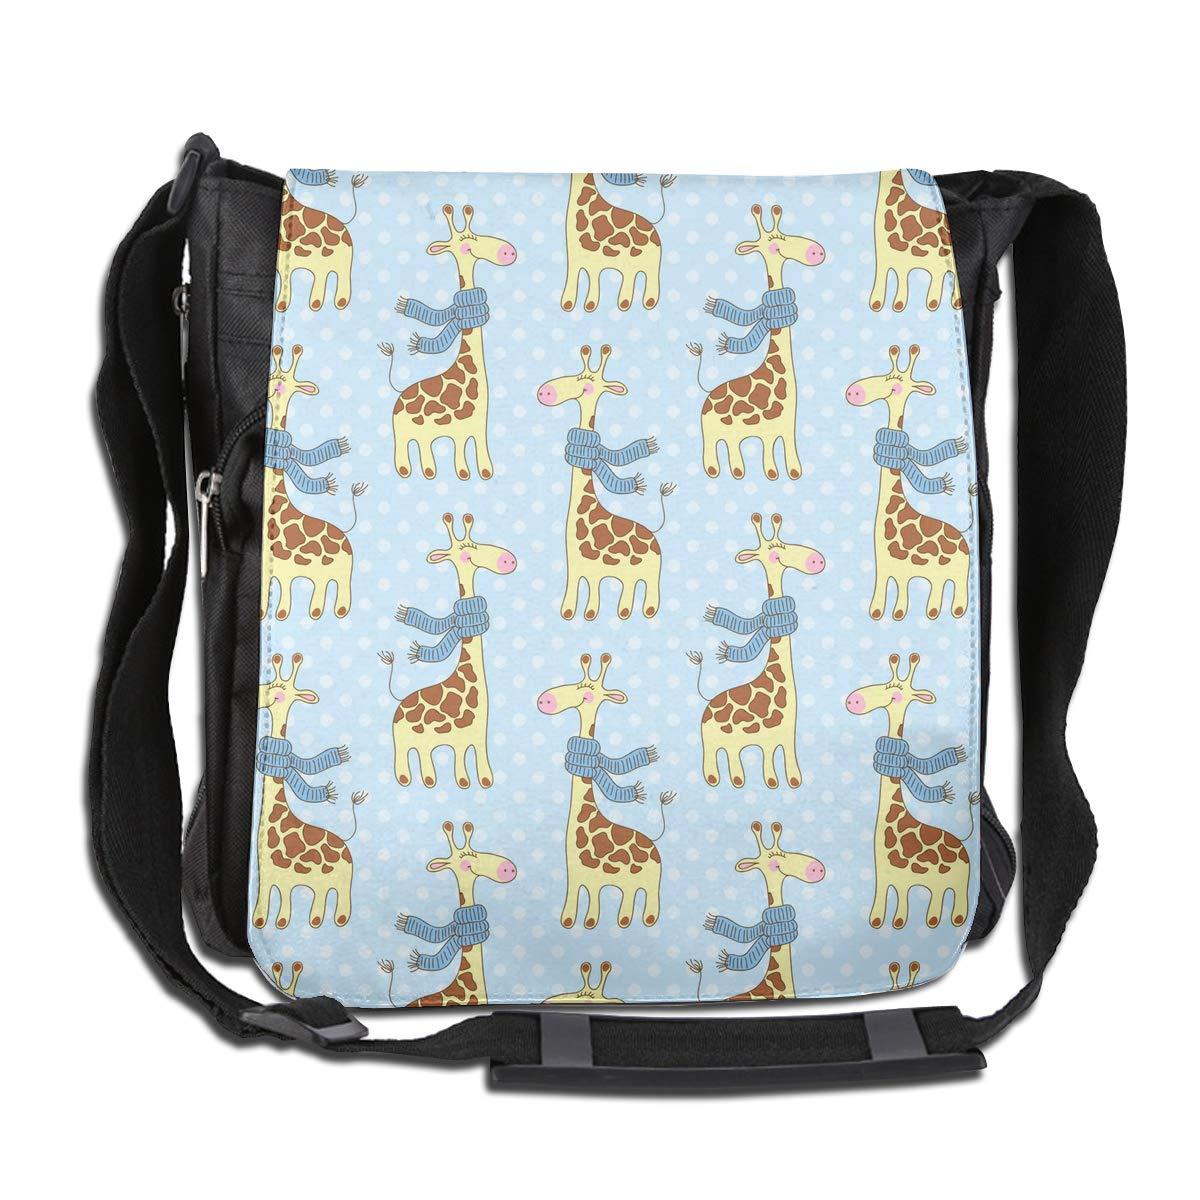 Cartoon Scarf Giraffe Men Women Inspirational Satchel Messenger Bags Crossbody Sling Working Bag Travel Shoulder Bags Office//School